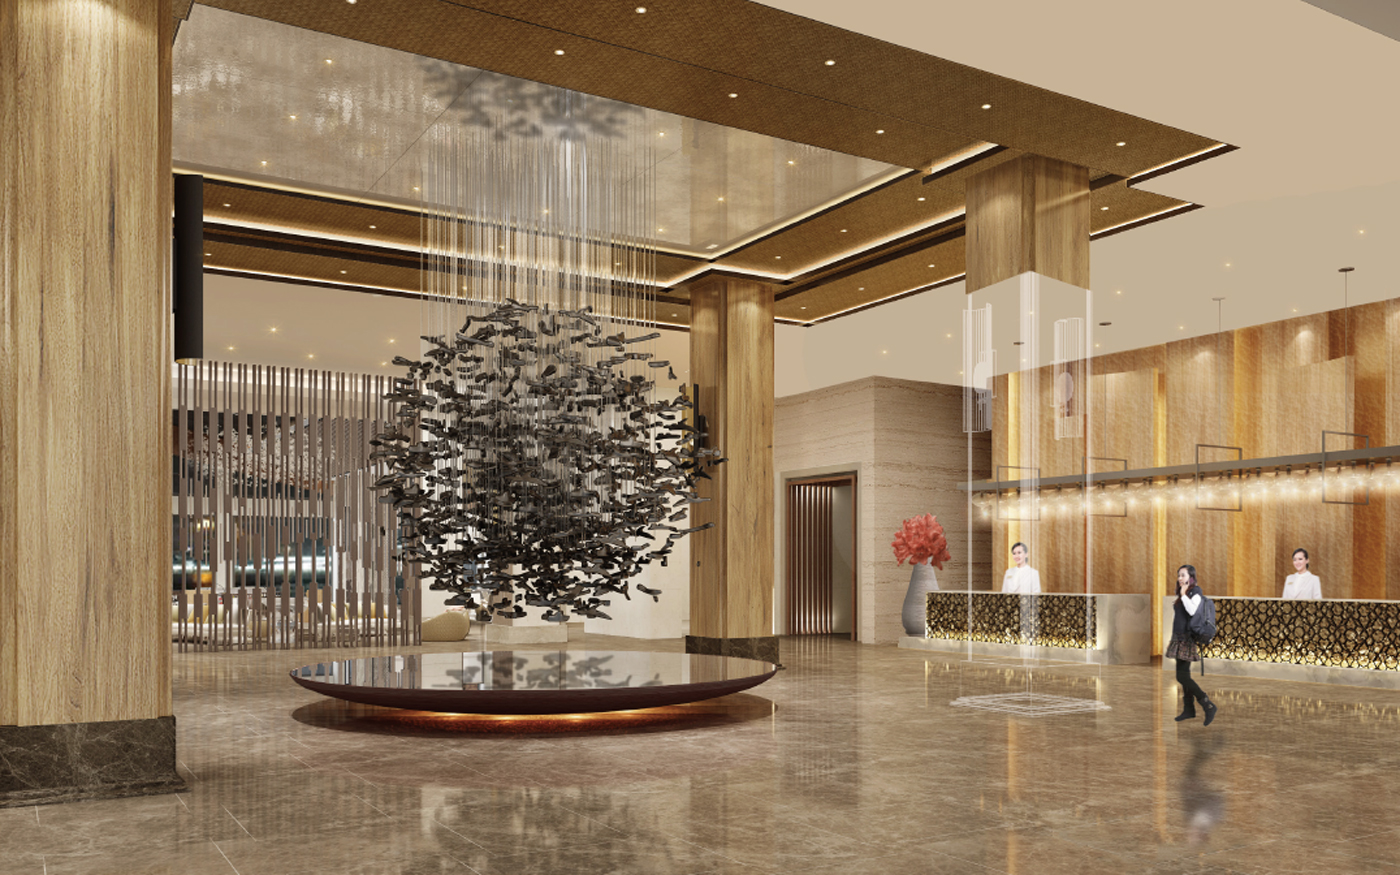 Doubletree-By-Hilton-Resort-_web_1